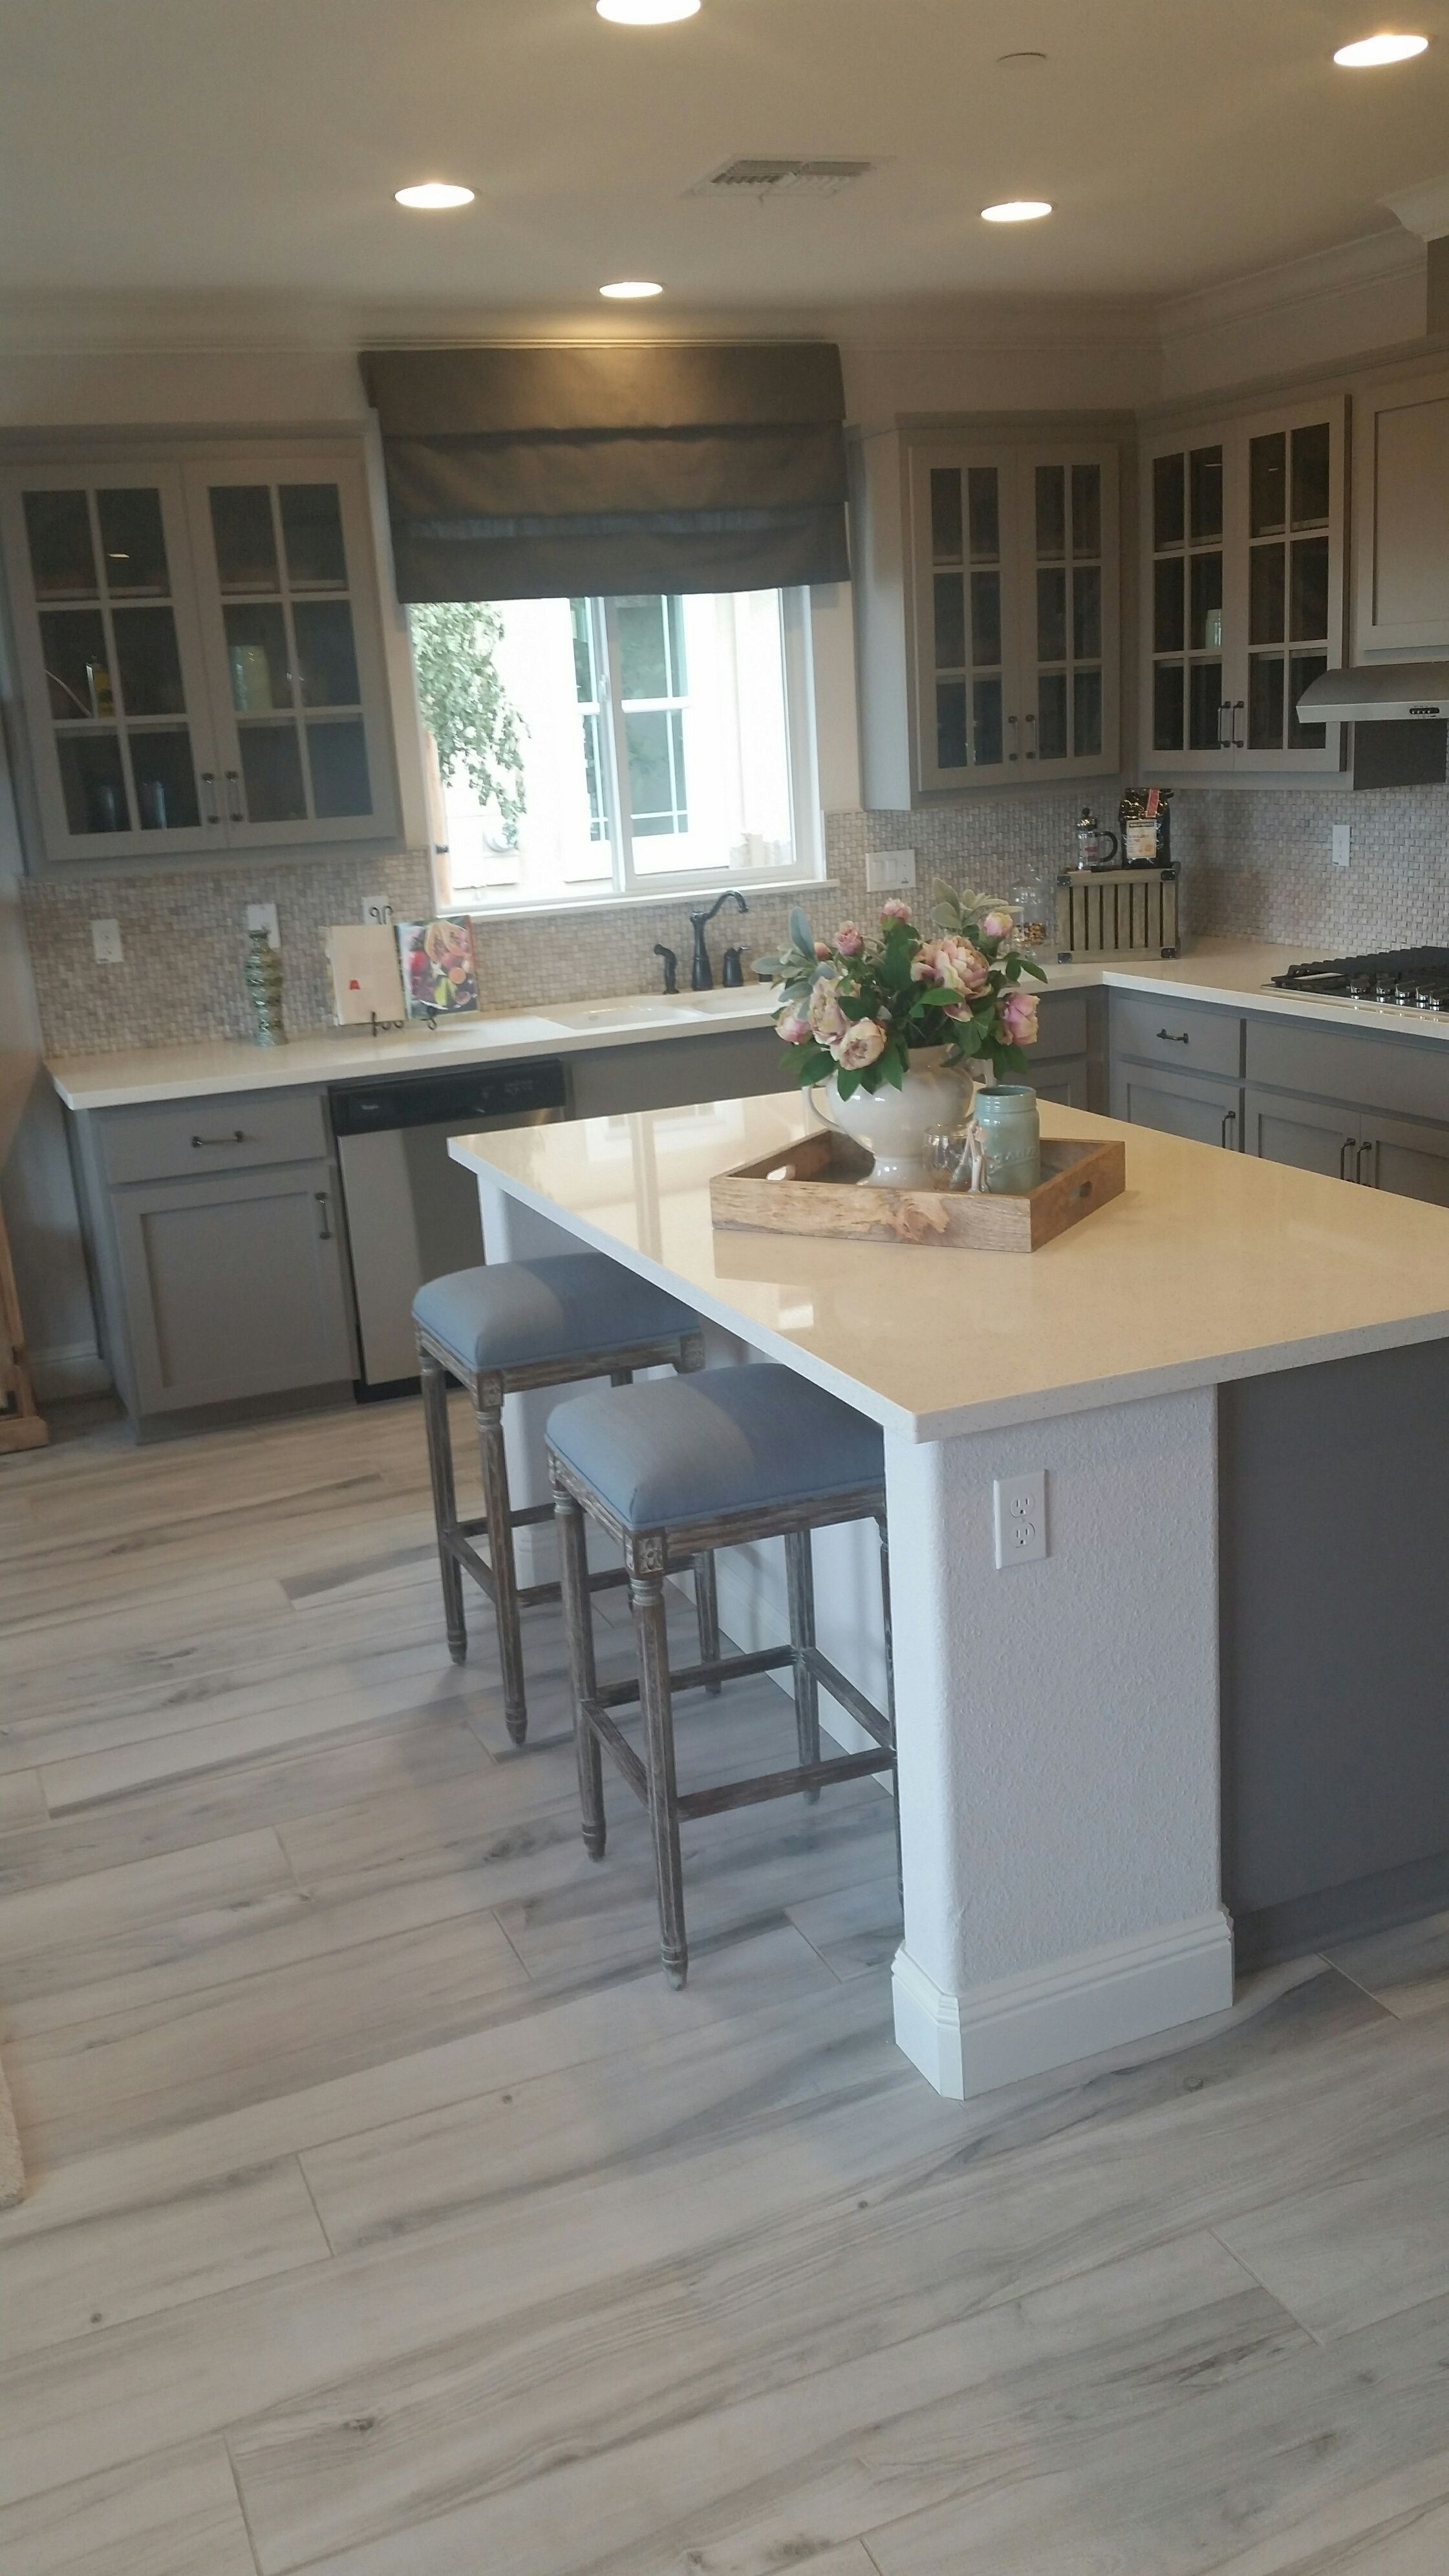 grey wood kitchen flooring farmhouse kitchen cabinets kitchen cabinet remodel kitchen floor tile on farmhouse kitchen tile floor id=15432